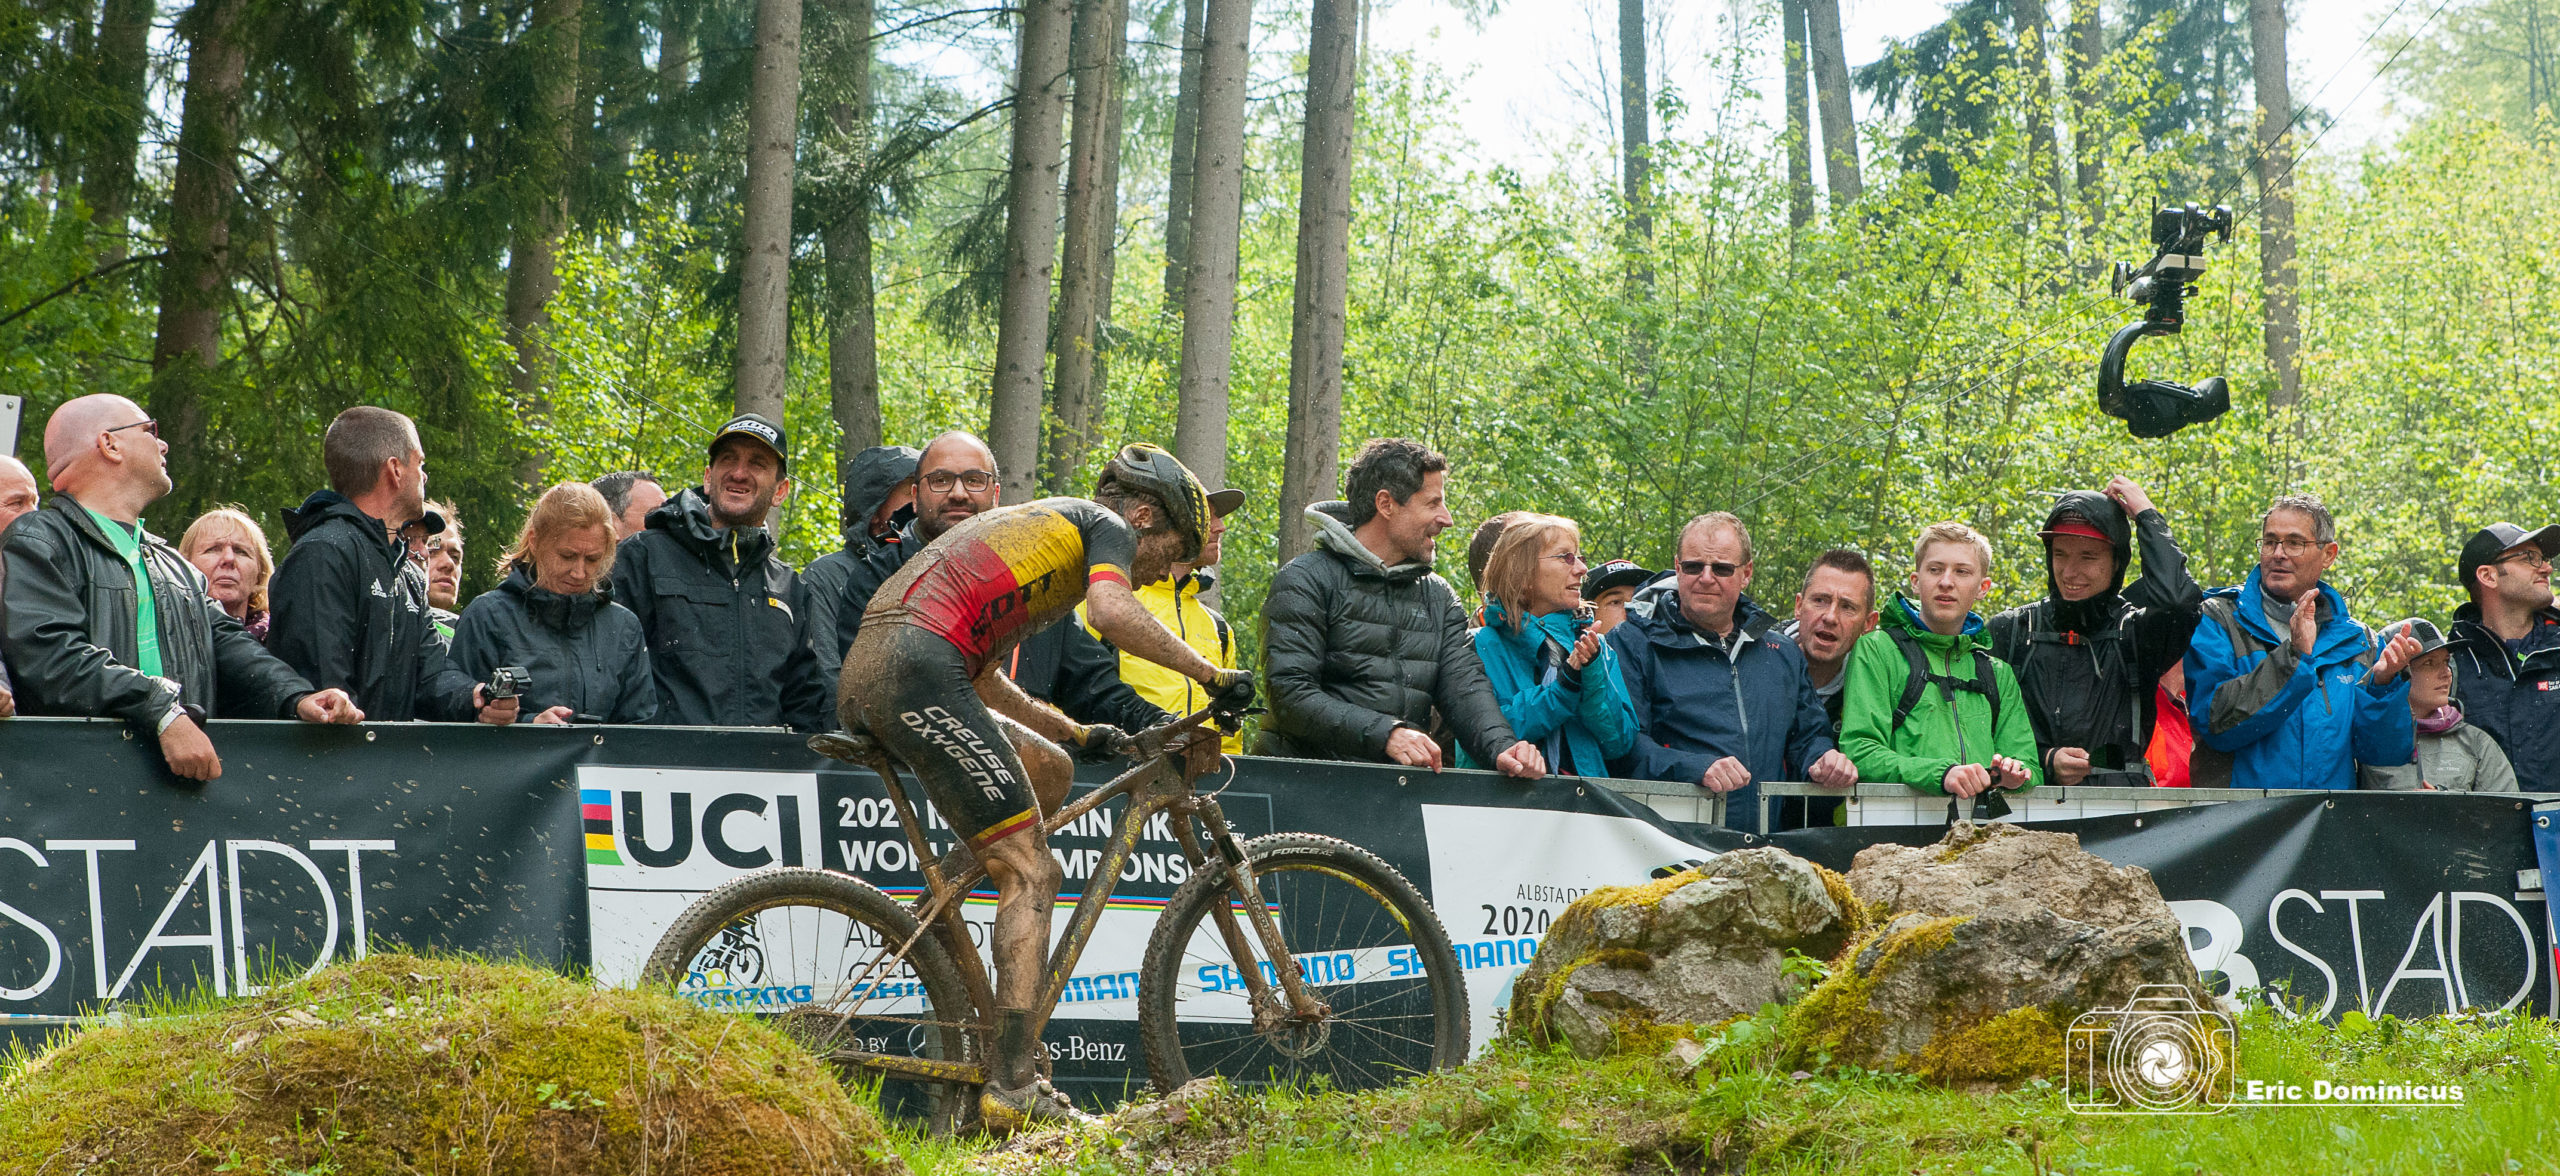 Organisatoren WK mountainbike houden alle opties open